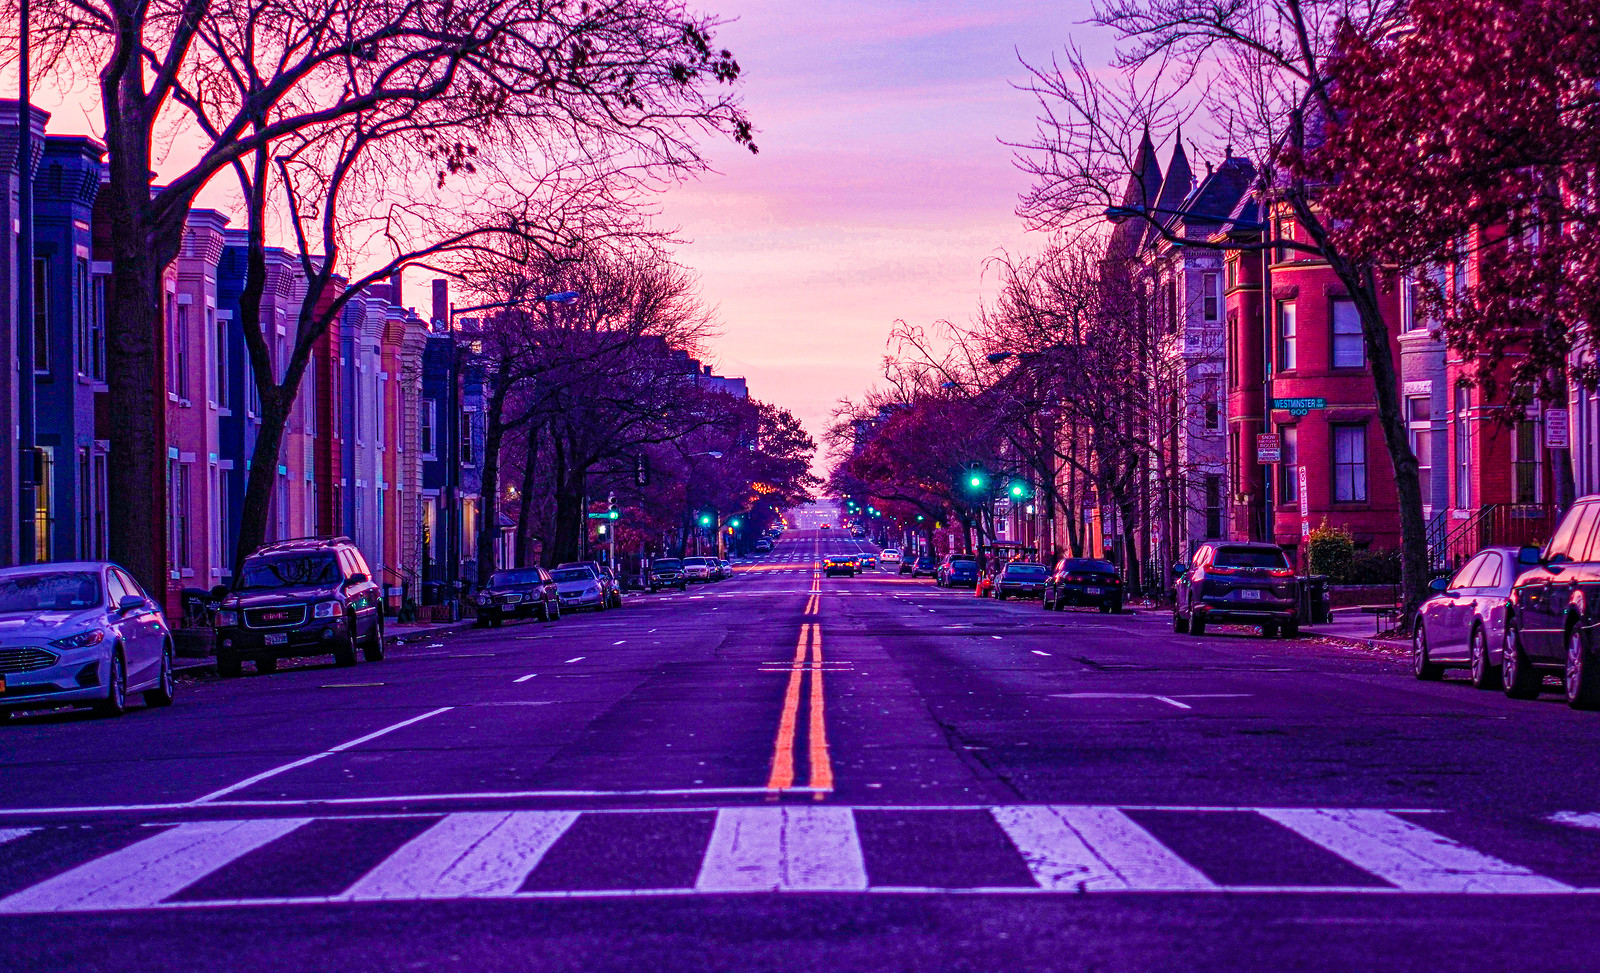 2020.08.17 DC Street, Washington, DC USA 359 06012